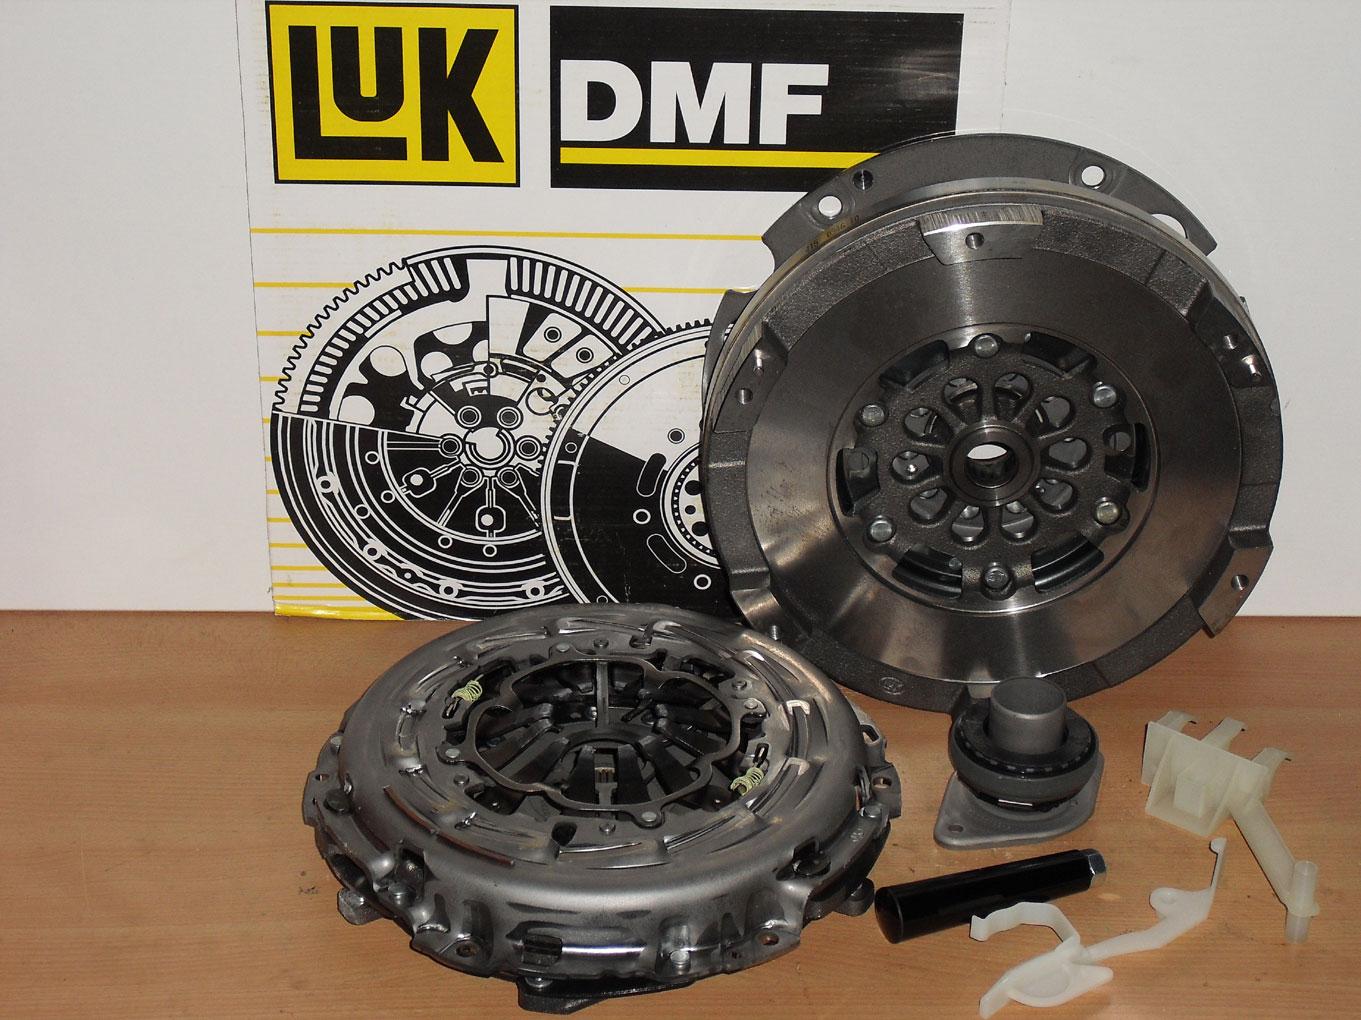 LUK 600004800 RepSet DMF Clutch Kit